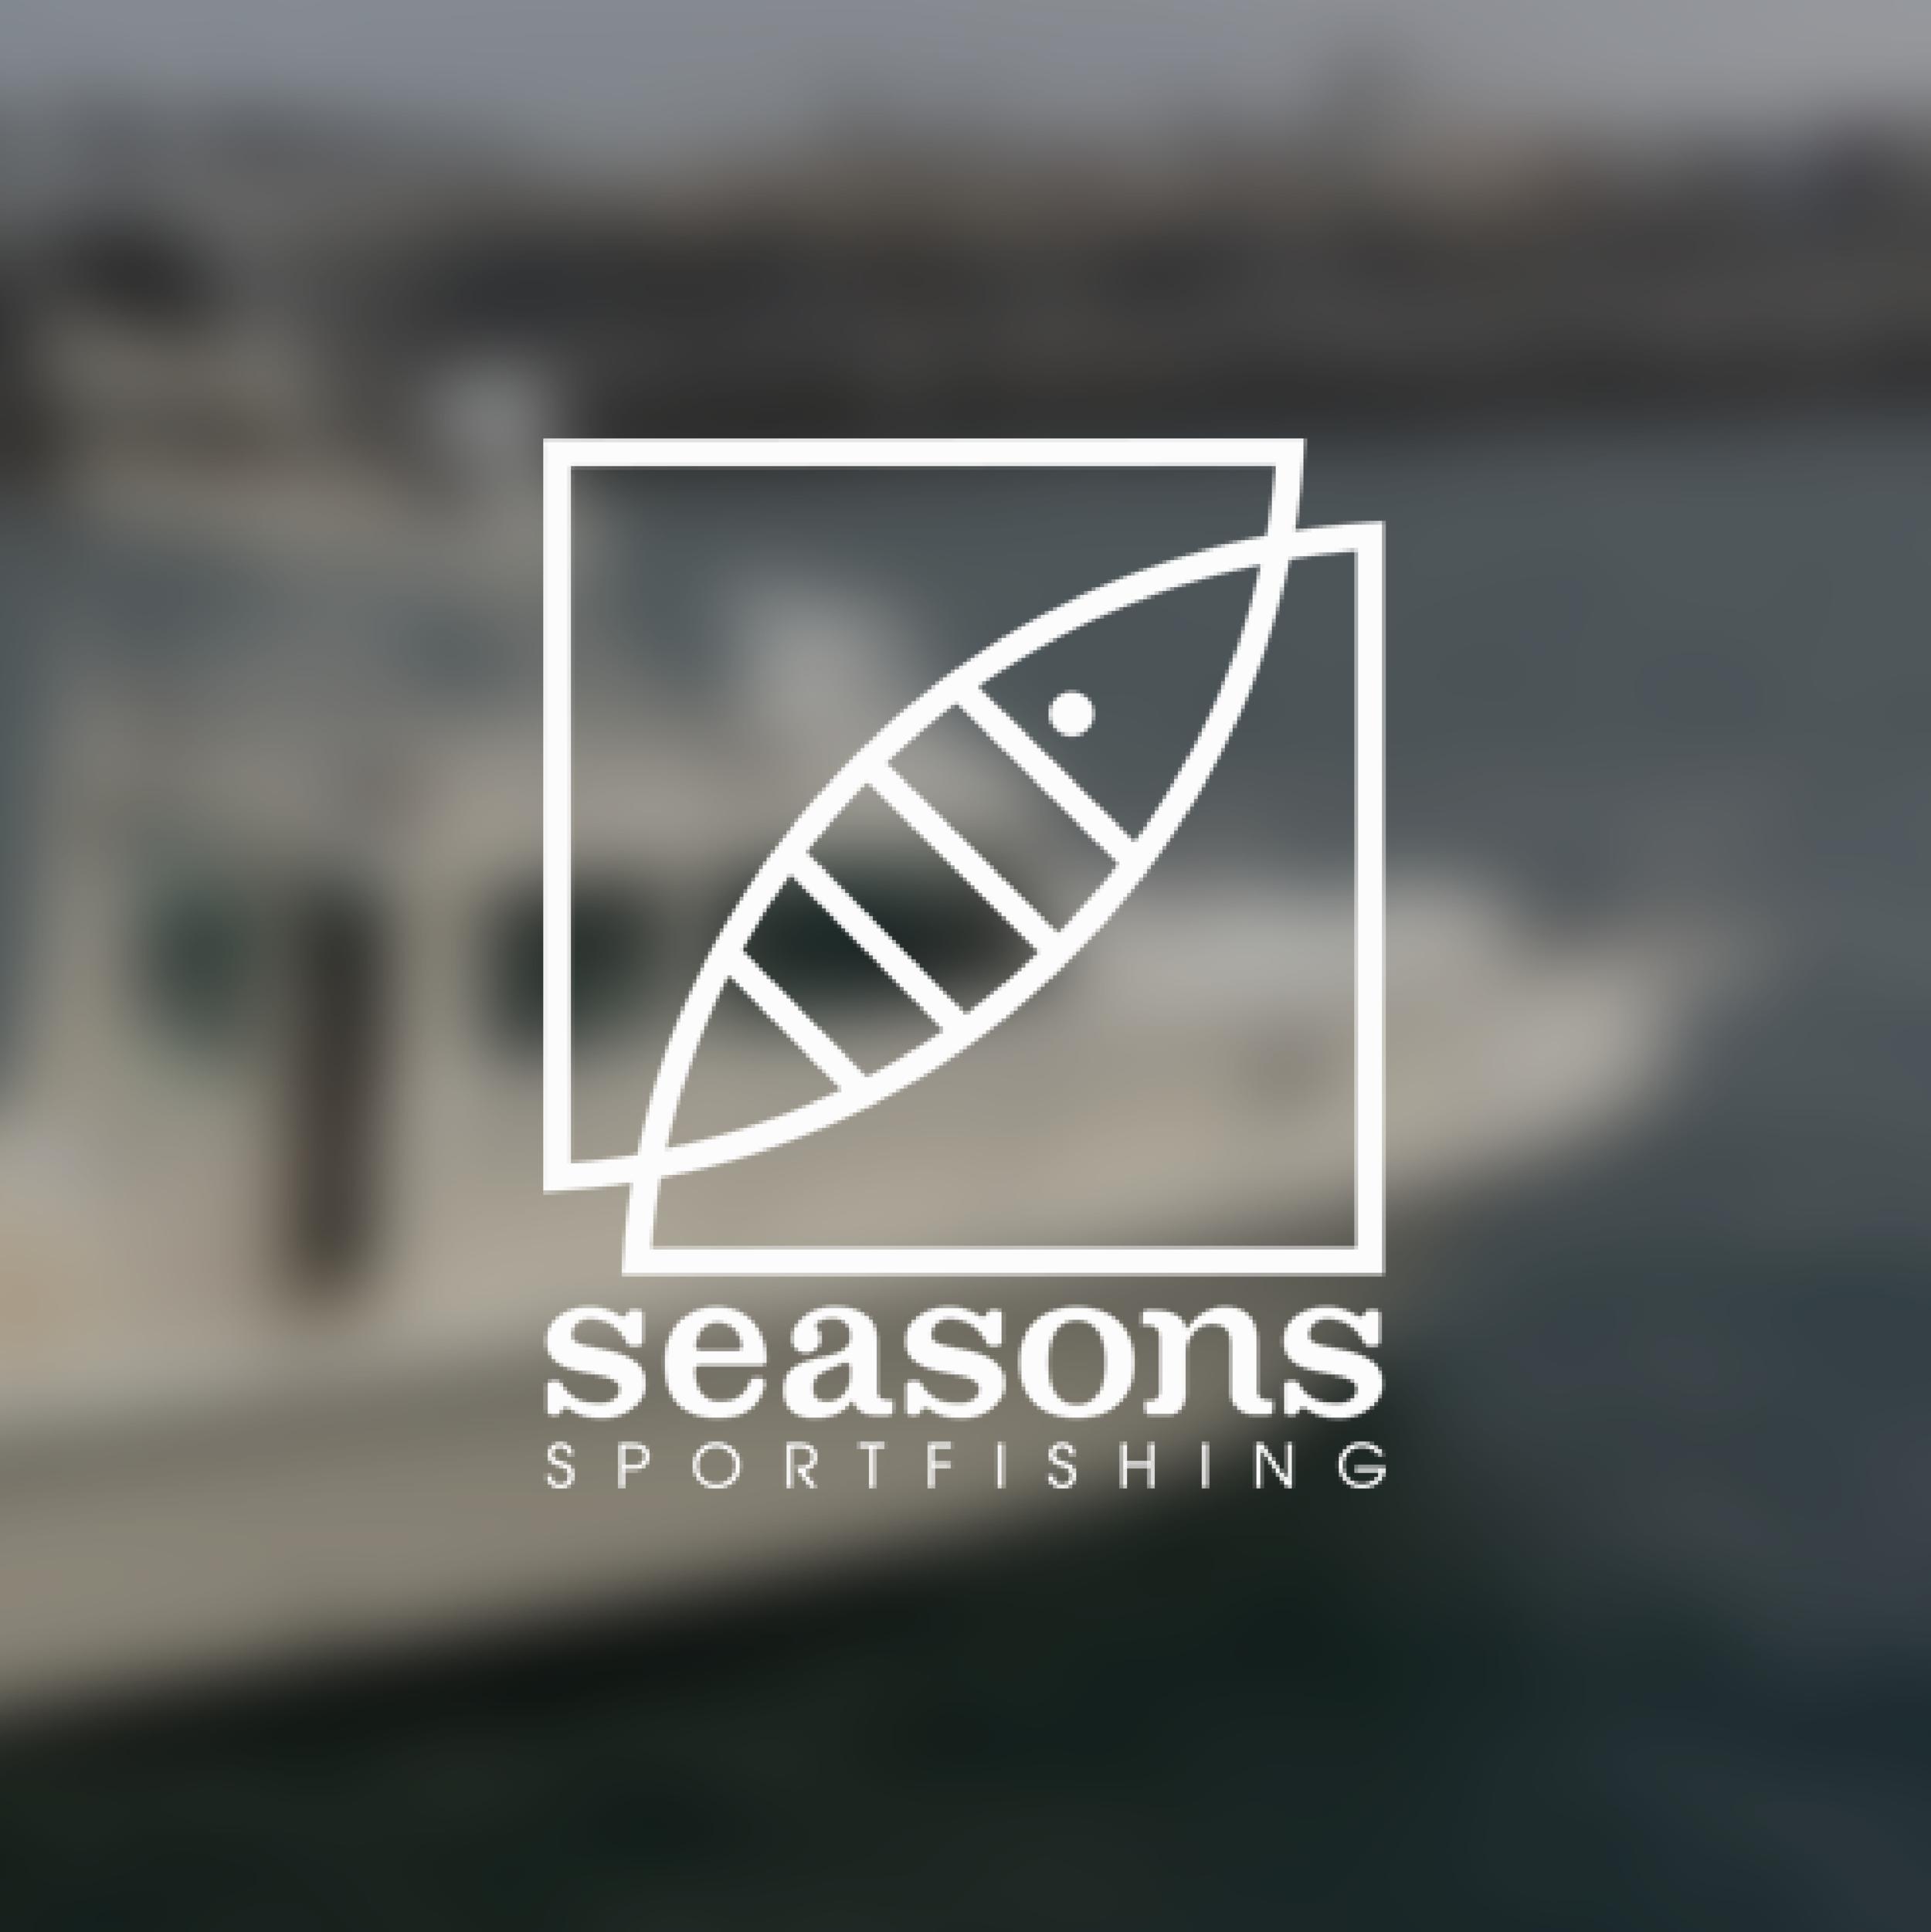 Beach Cities SD Buttons_Seasons Sportfishing Button.png